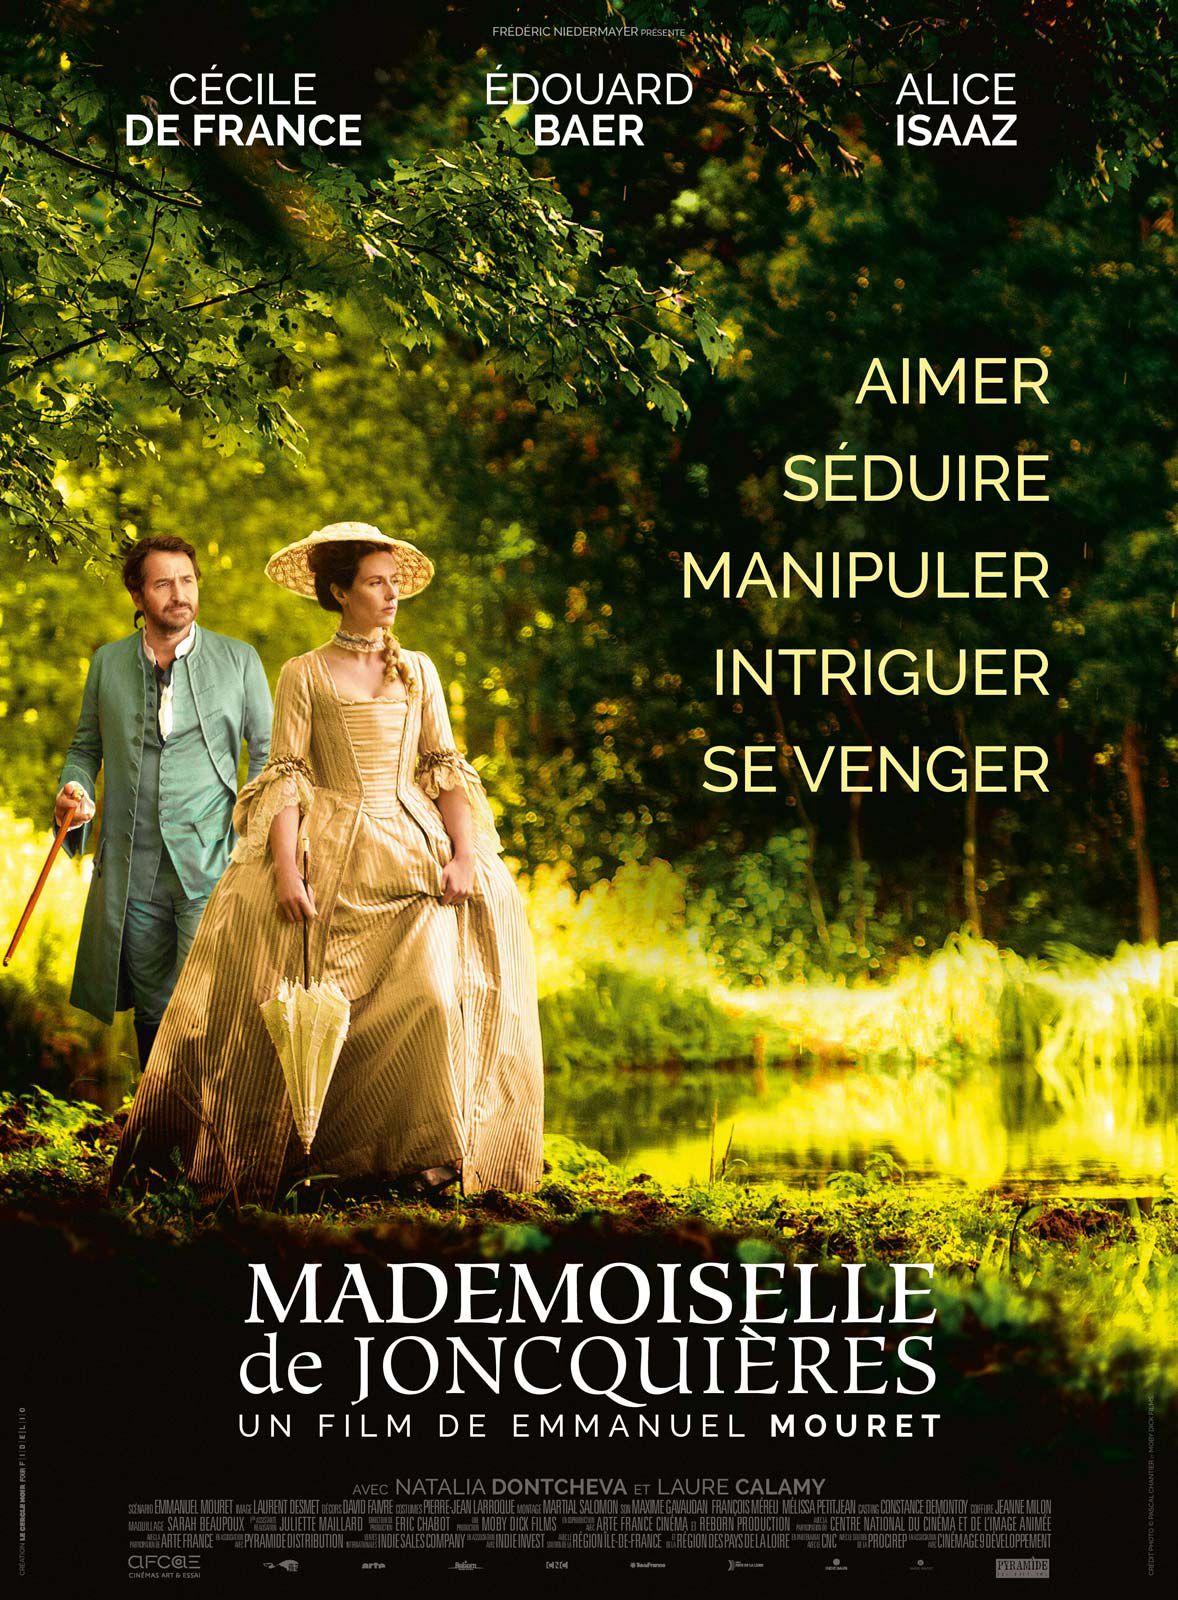 affiche film edouard baer alice isaaz cecile de france robe epoque